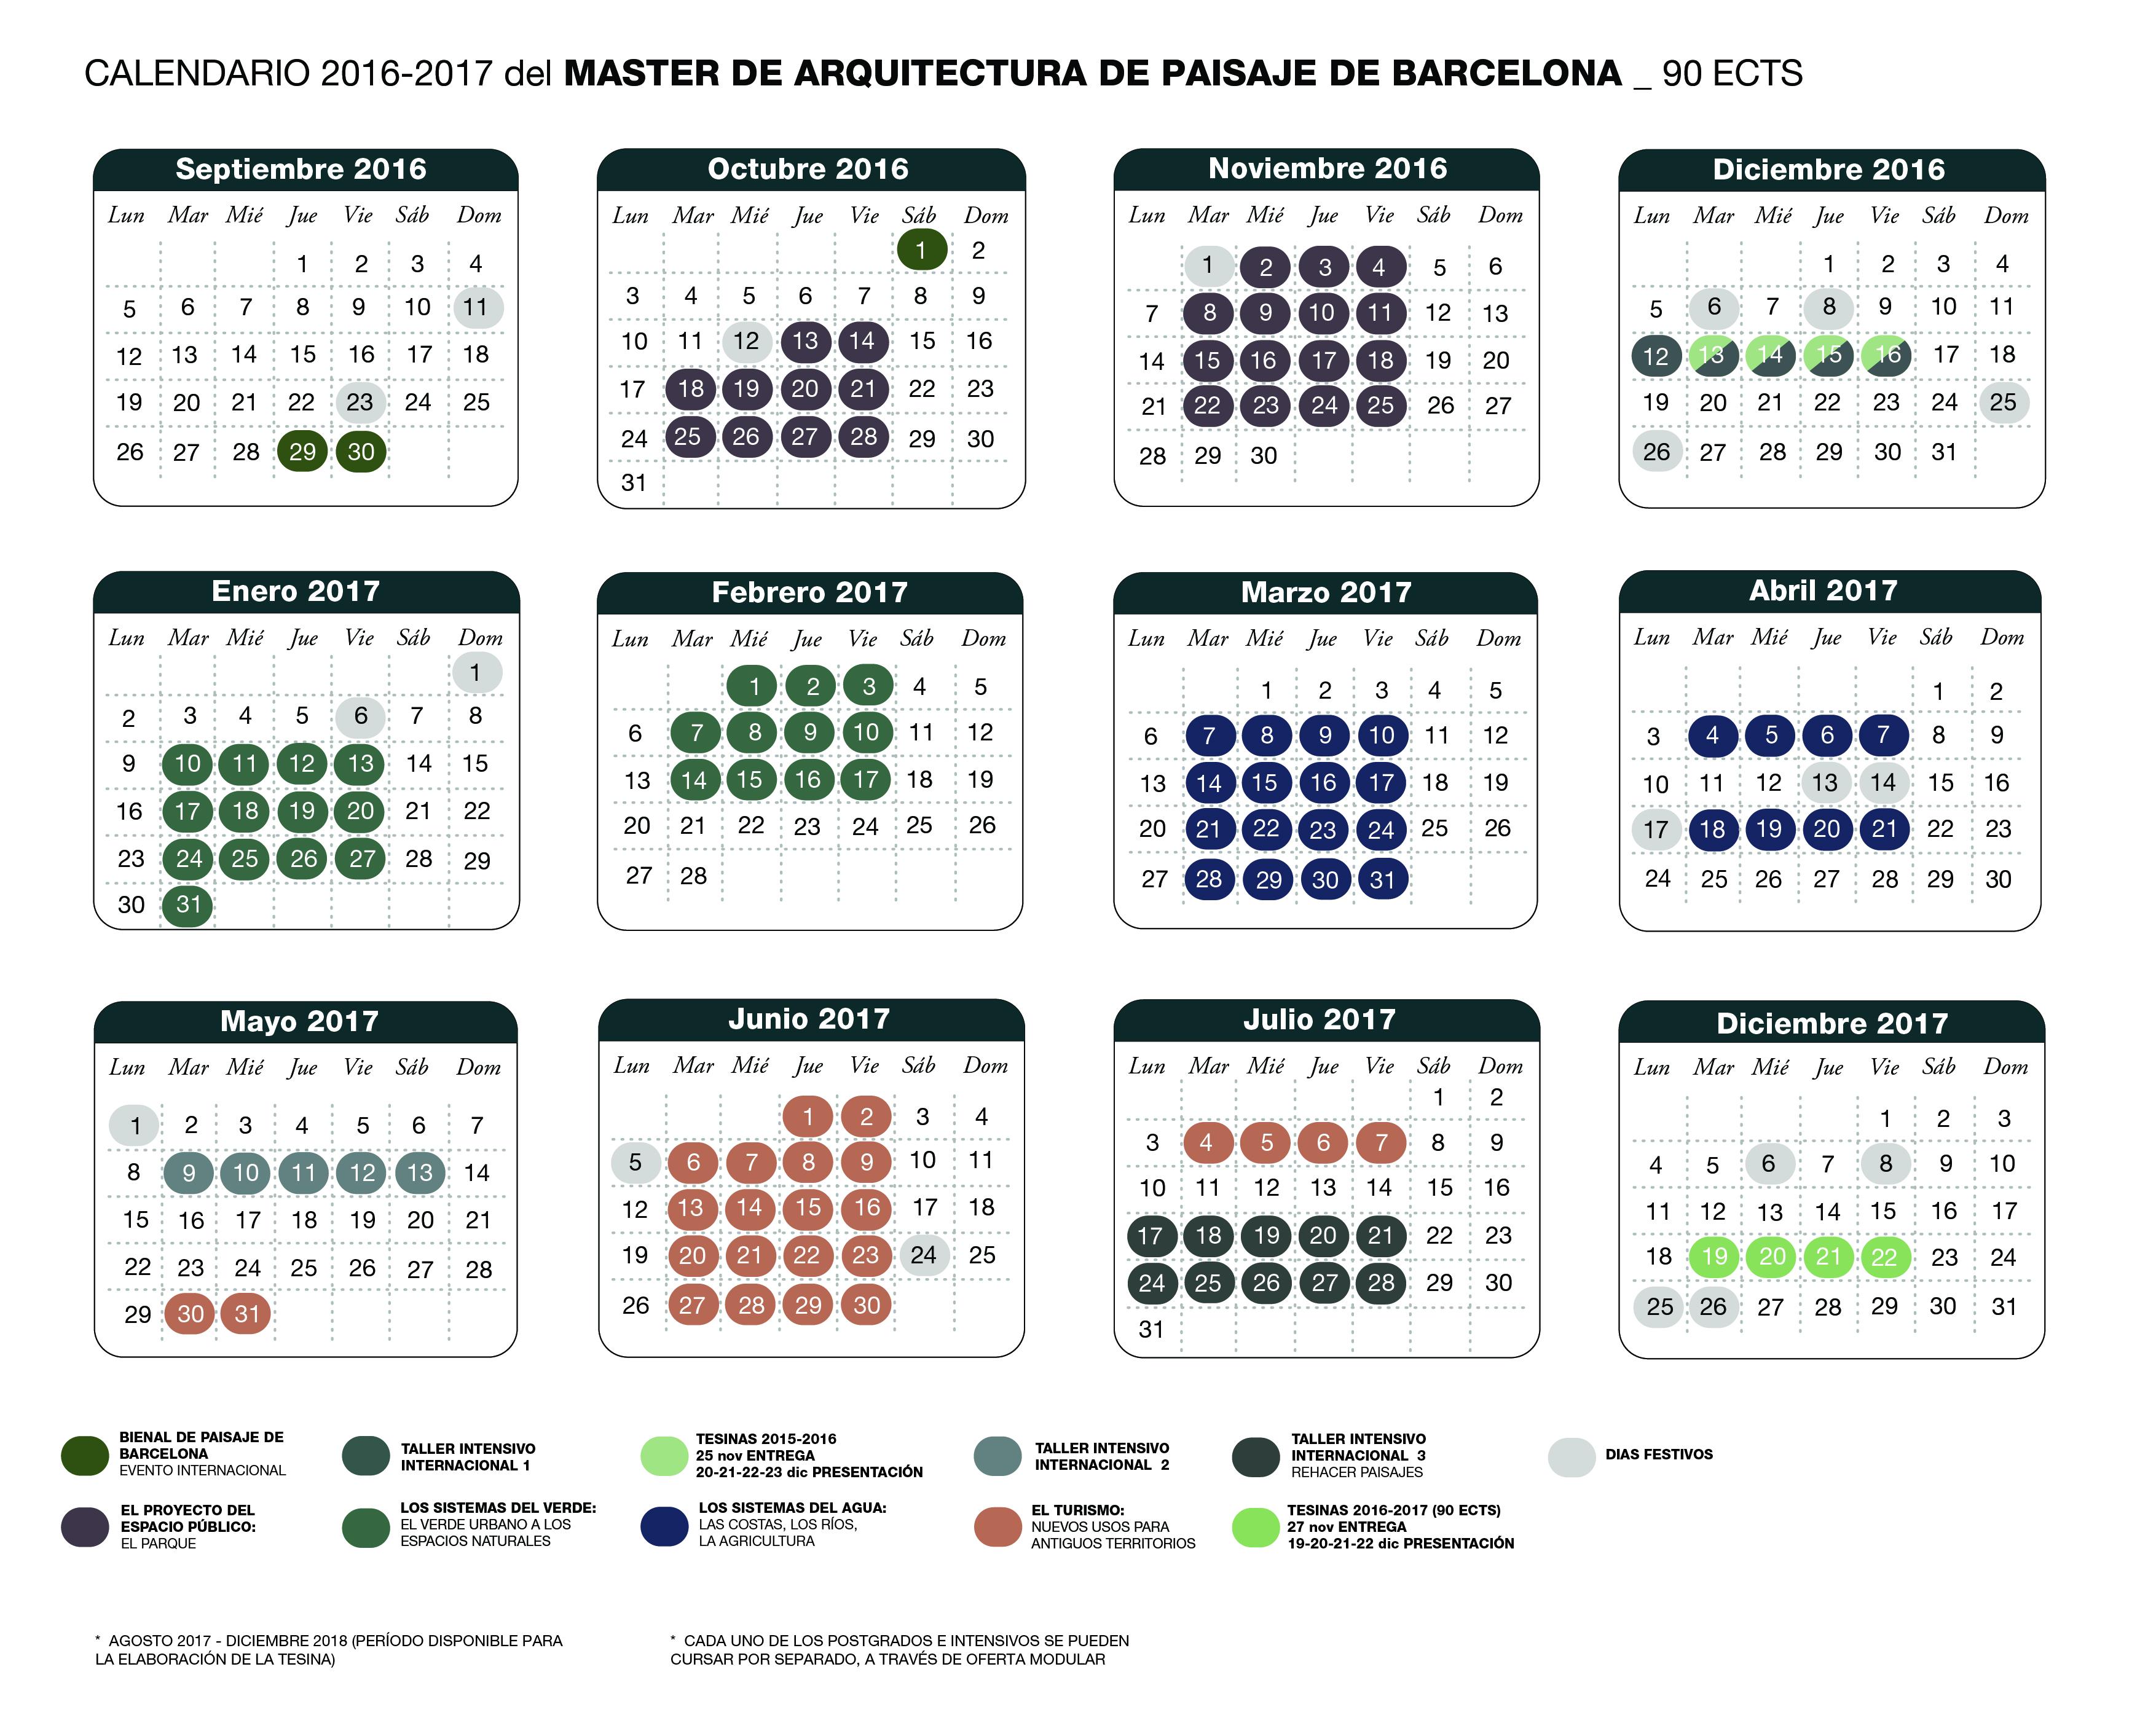 calendari map general 2016-2017 90 ECTS